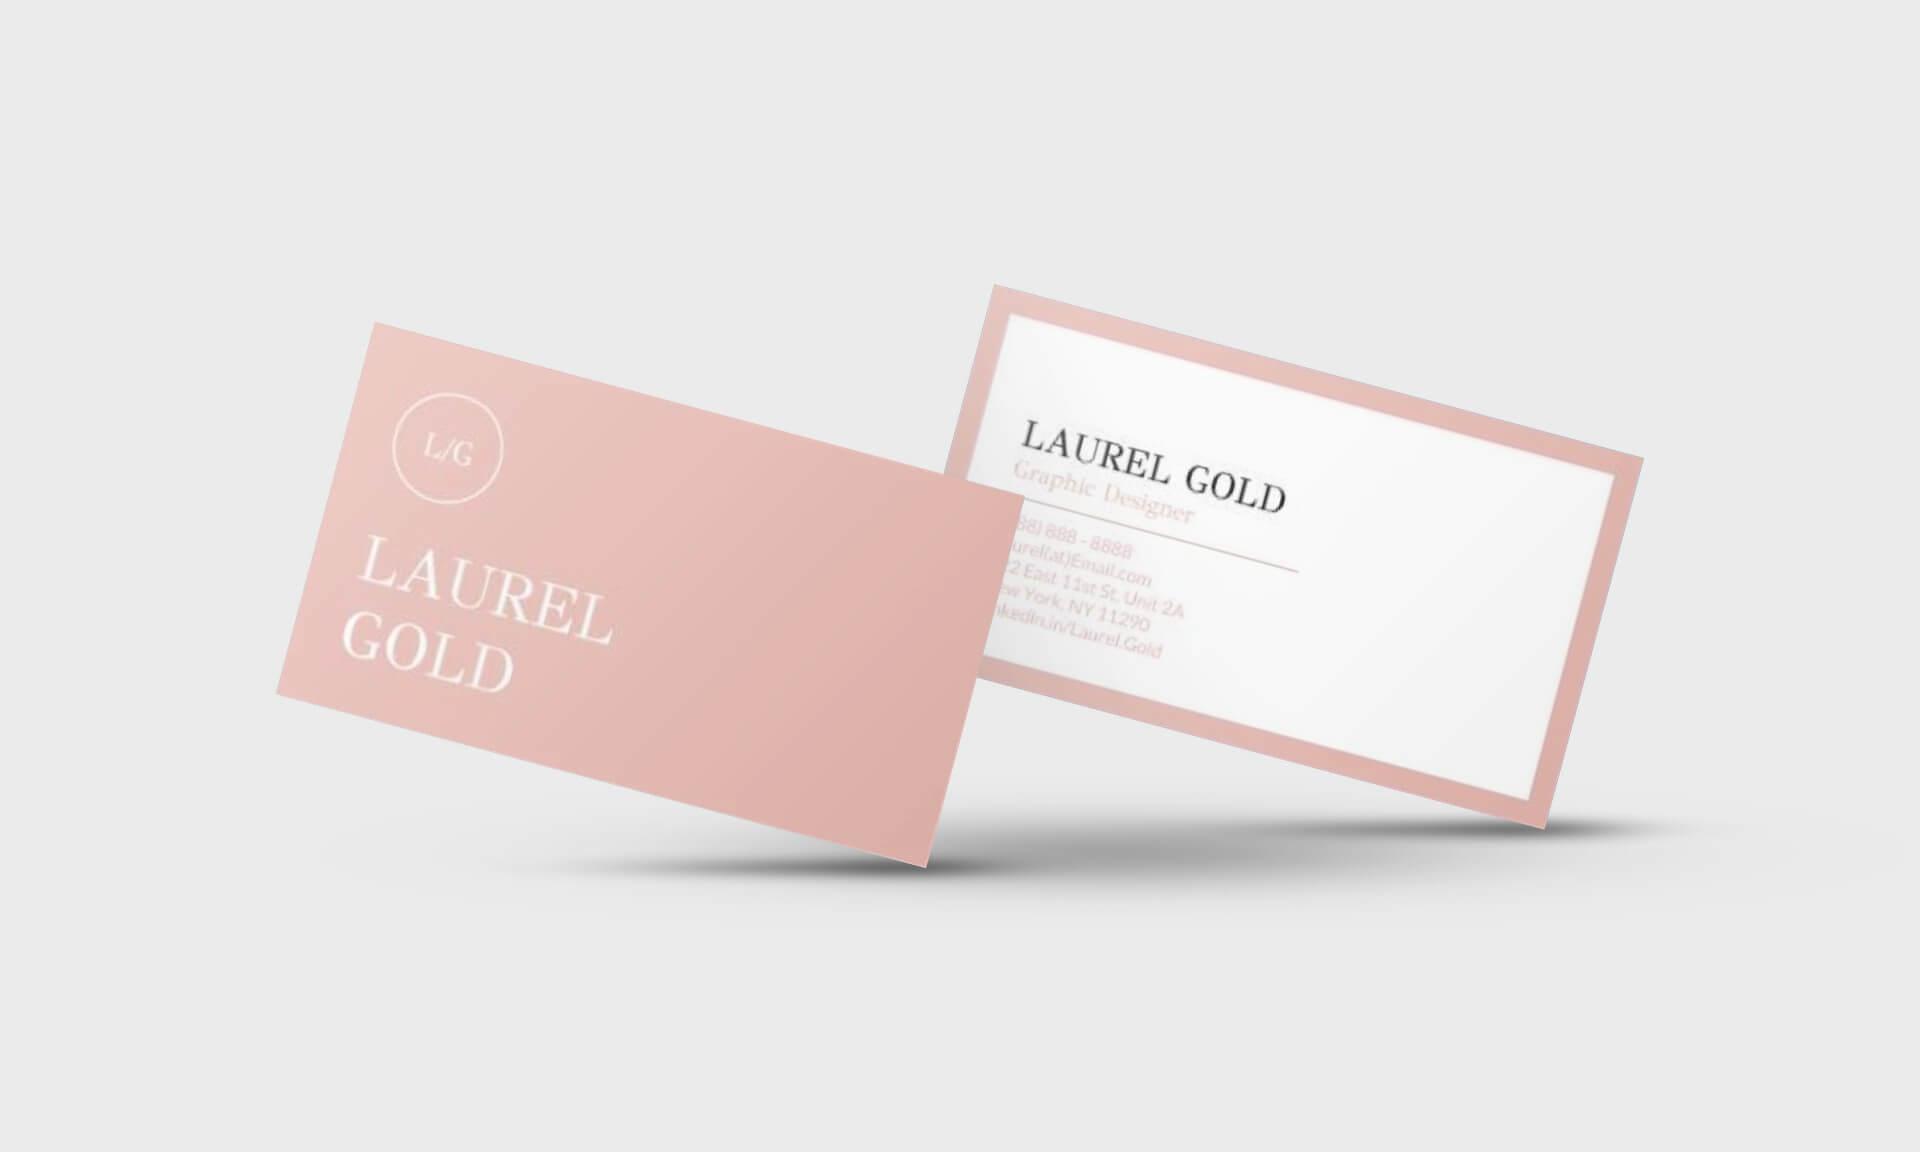 Laurel Gold Google Docs Business Card Template - Stand Out Shop In Business Card Template For Google Docs